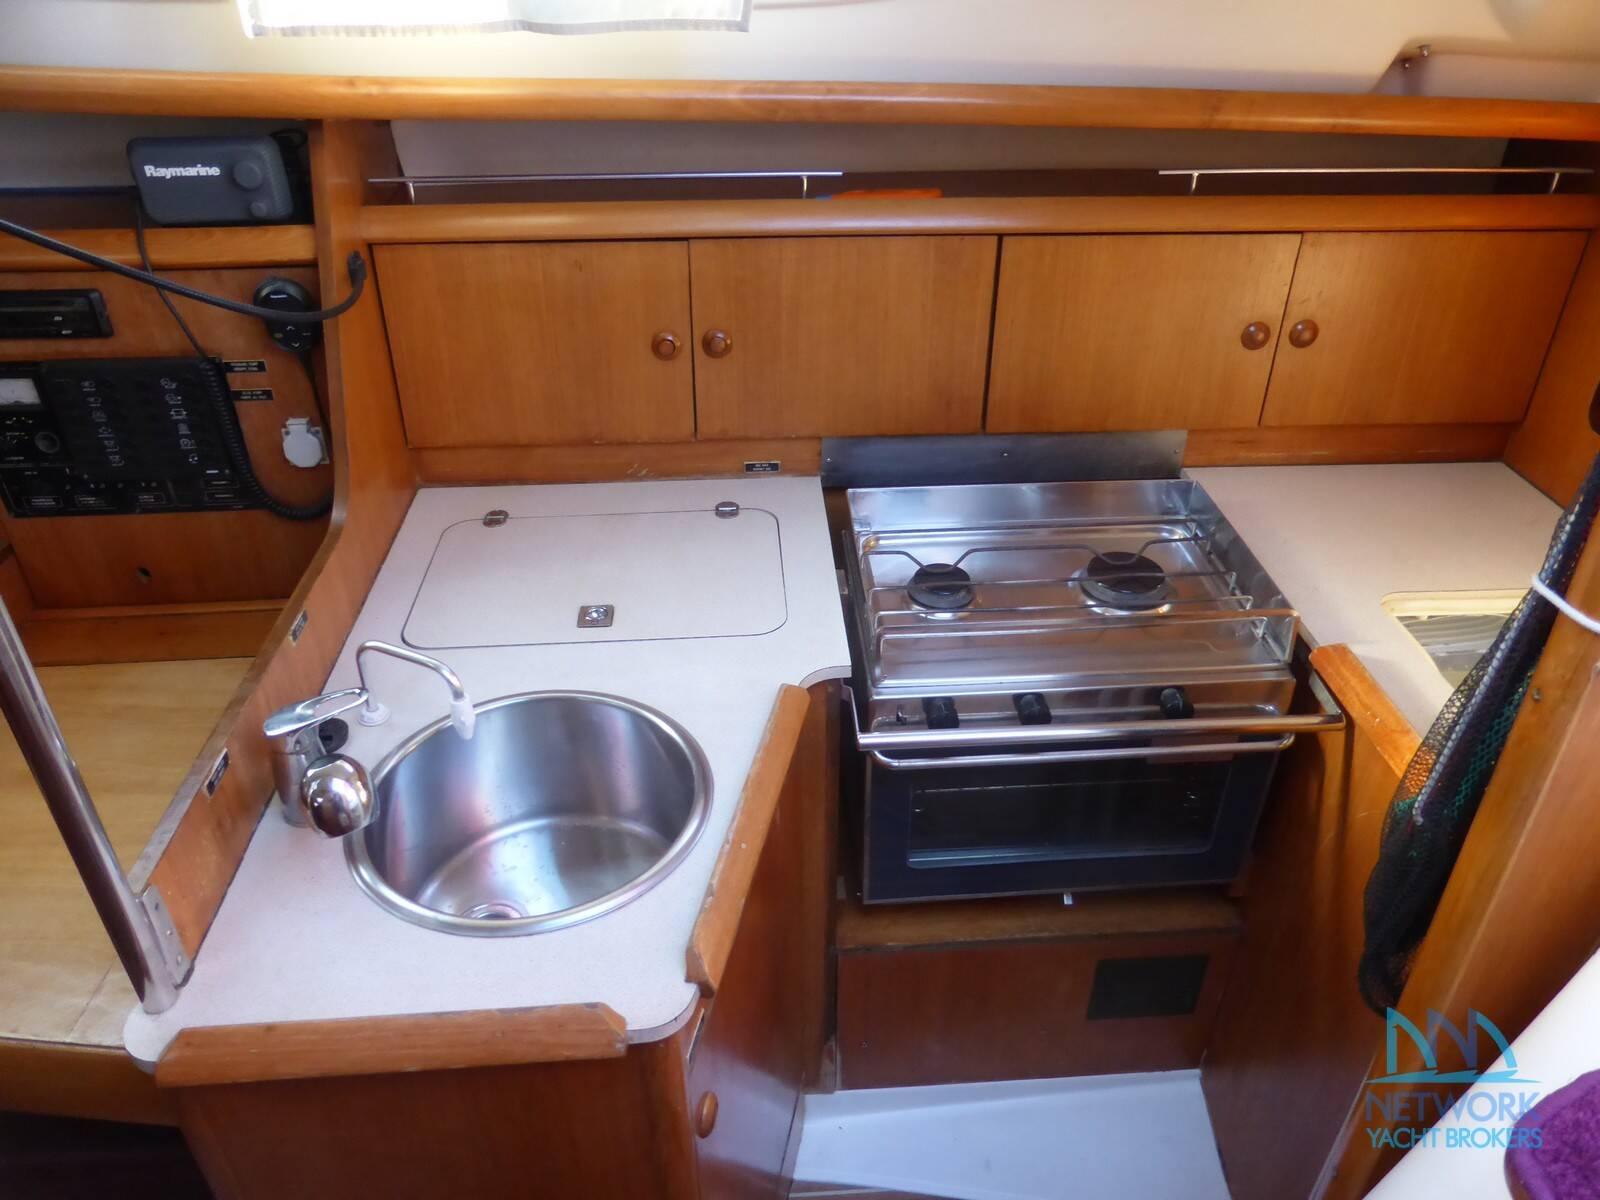 refrigerator, sink, gas oven